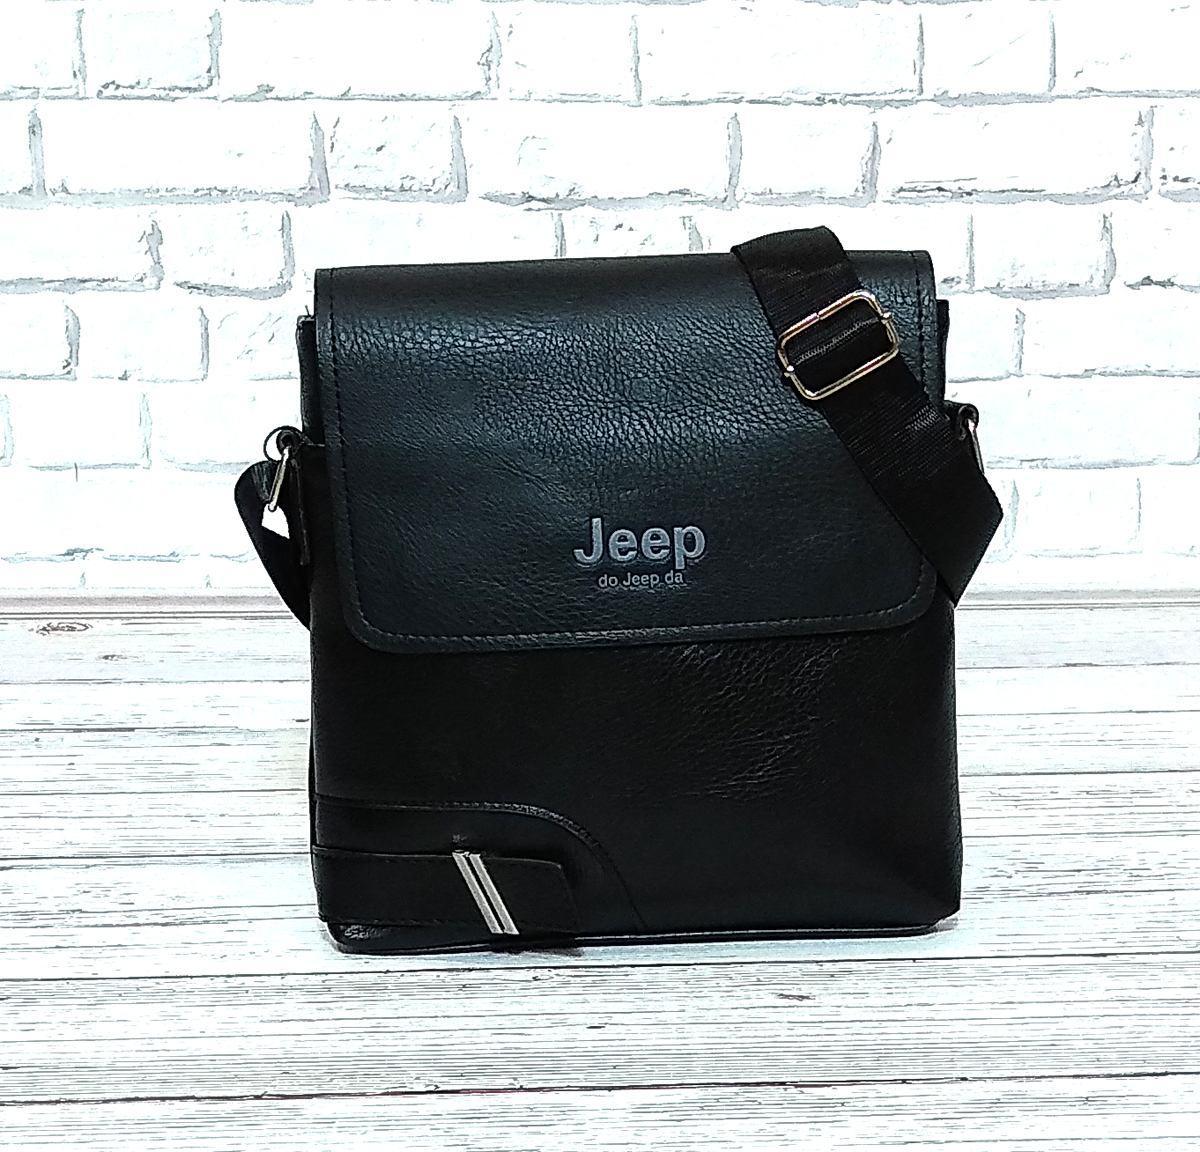 Мужская сумка через плечо Jeep. Черная. 25x23х5 Кожа PU / 559-2 black